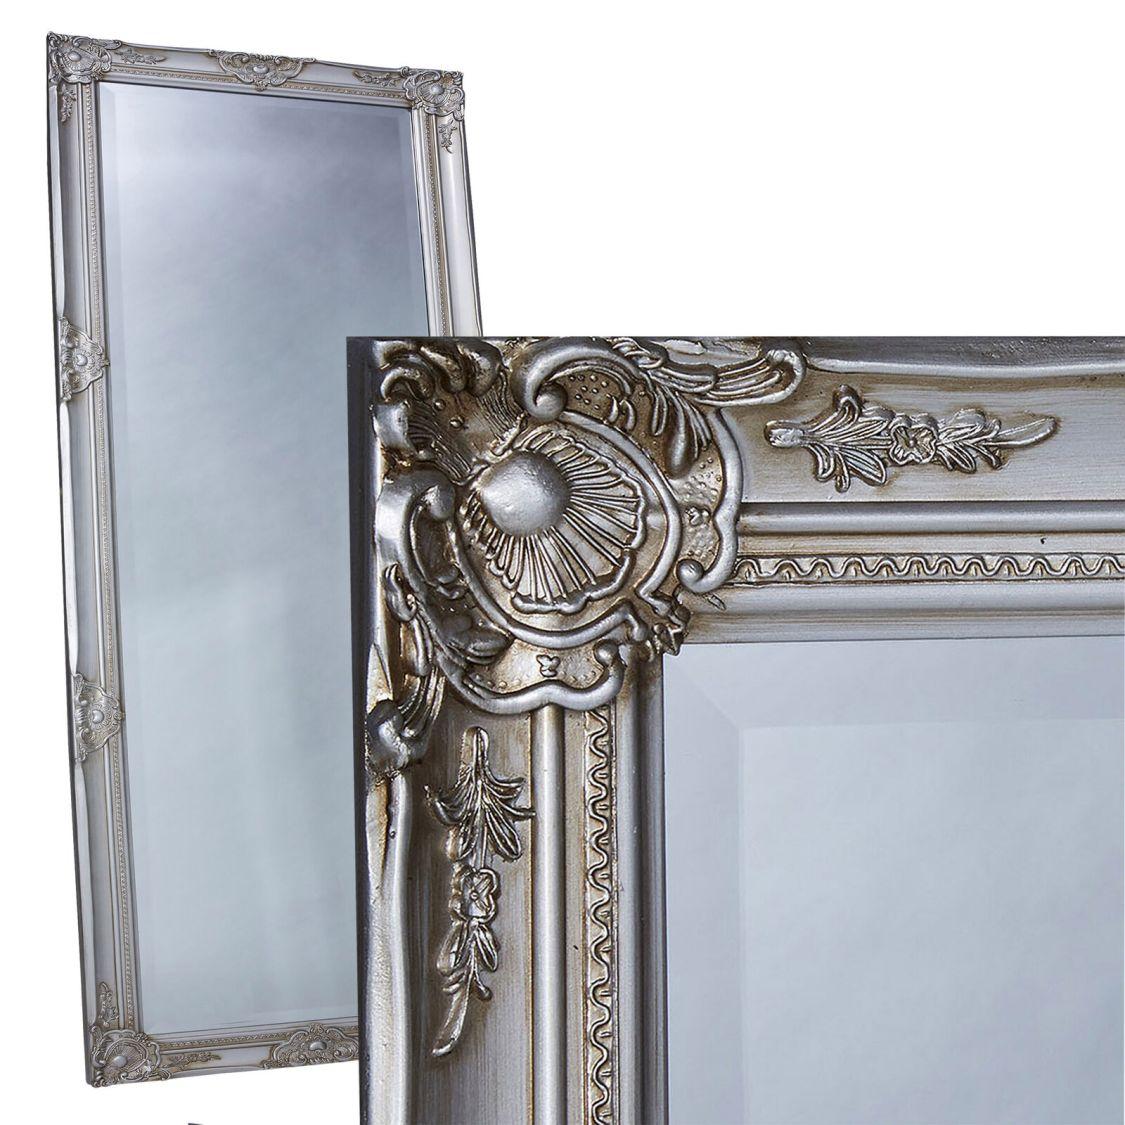 Wandspiegel Spiegel silber ca. 180 x 80 cm antik Barock mit Facettenschliff